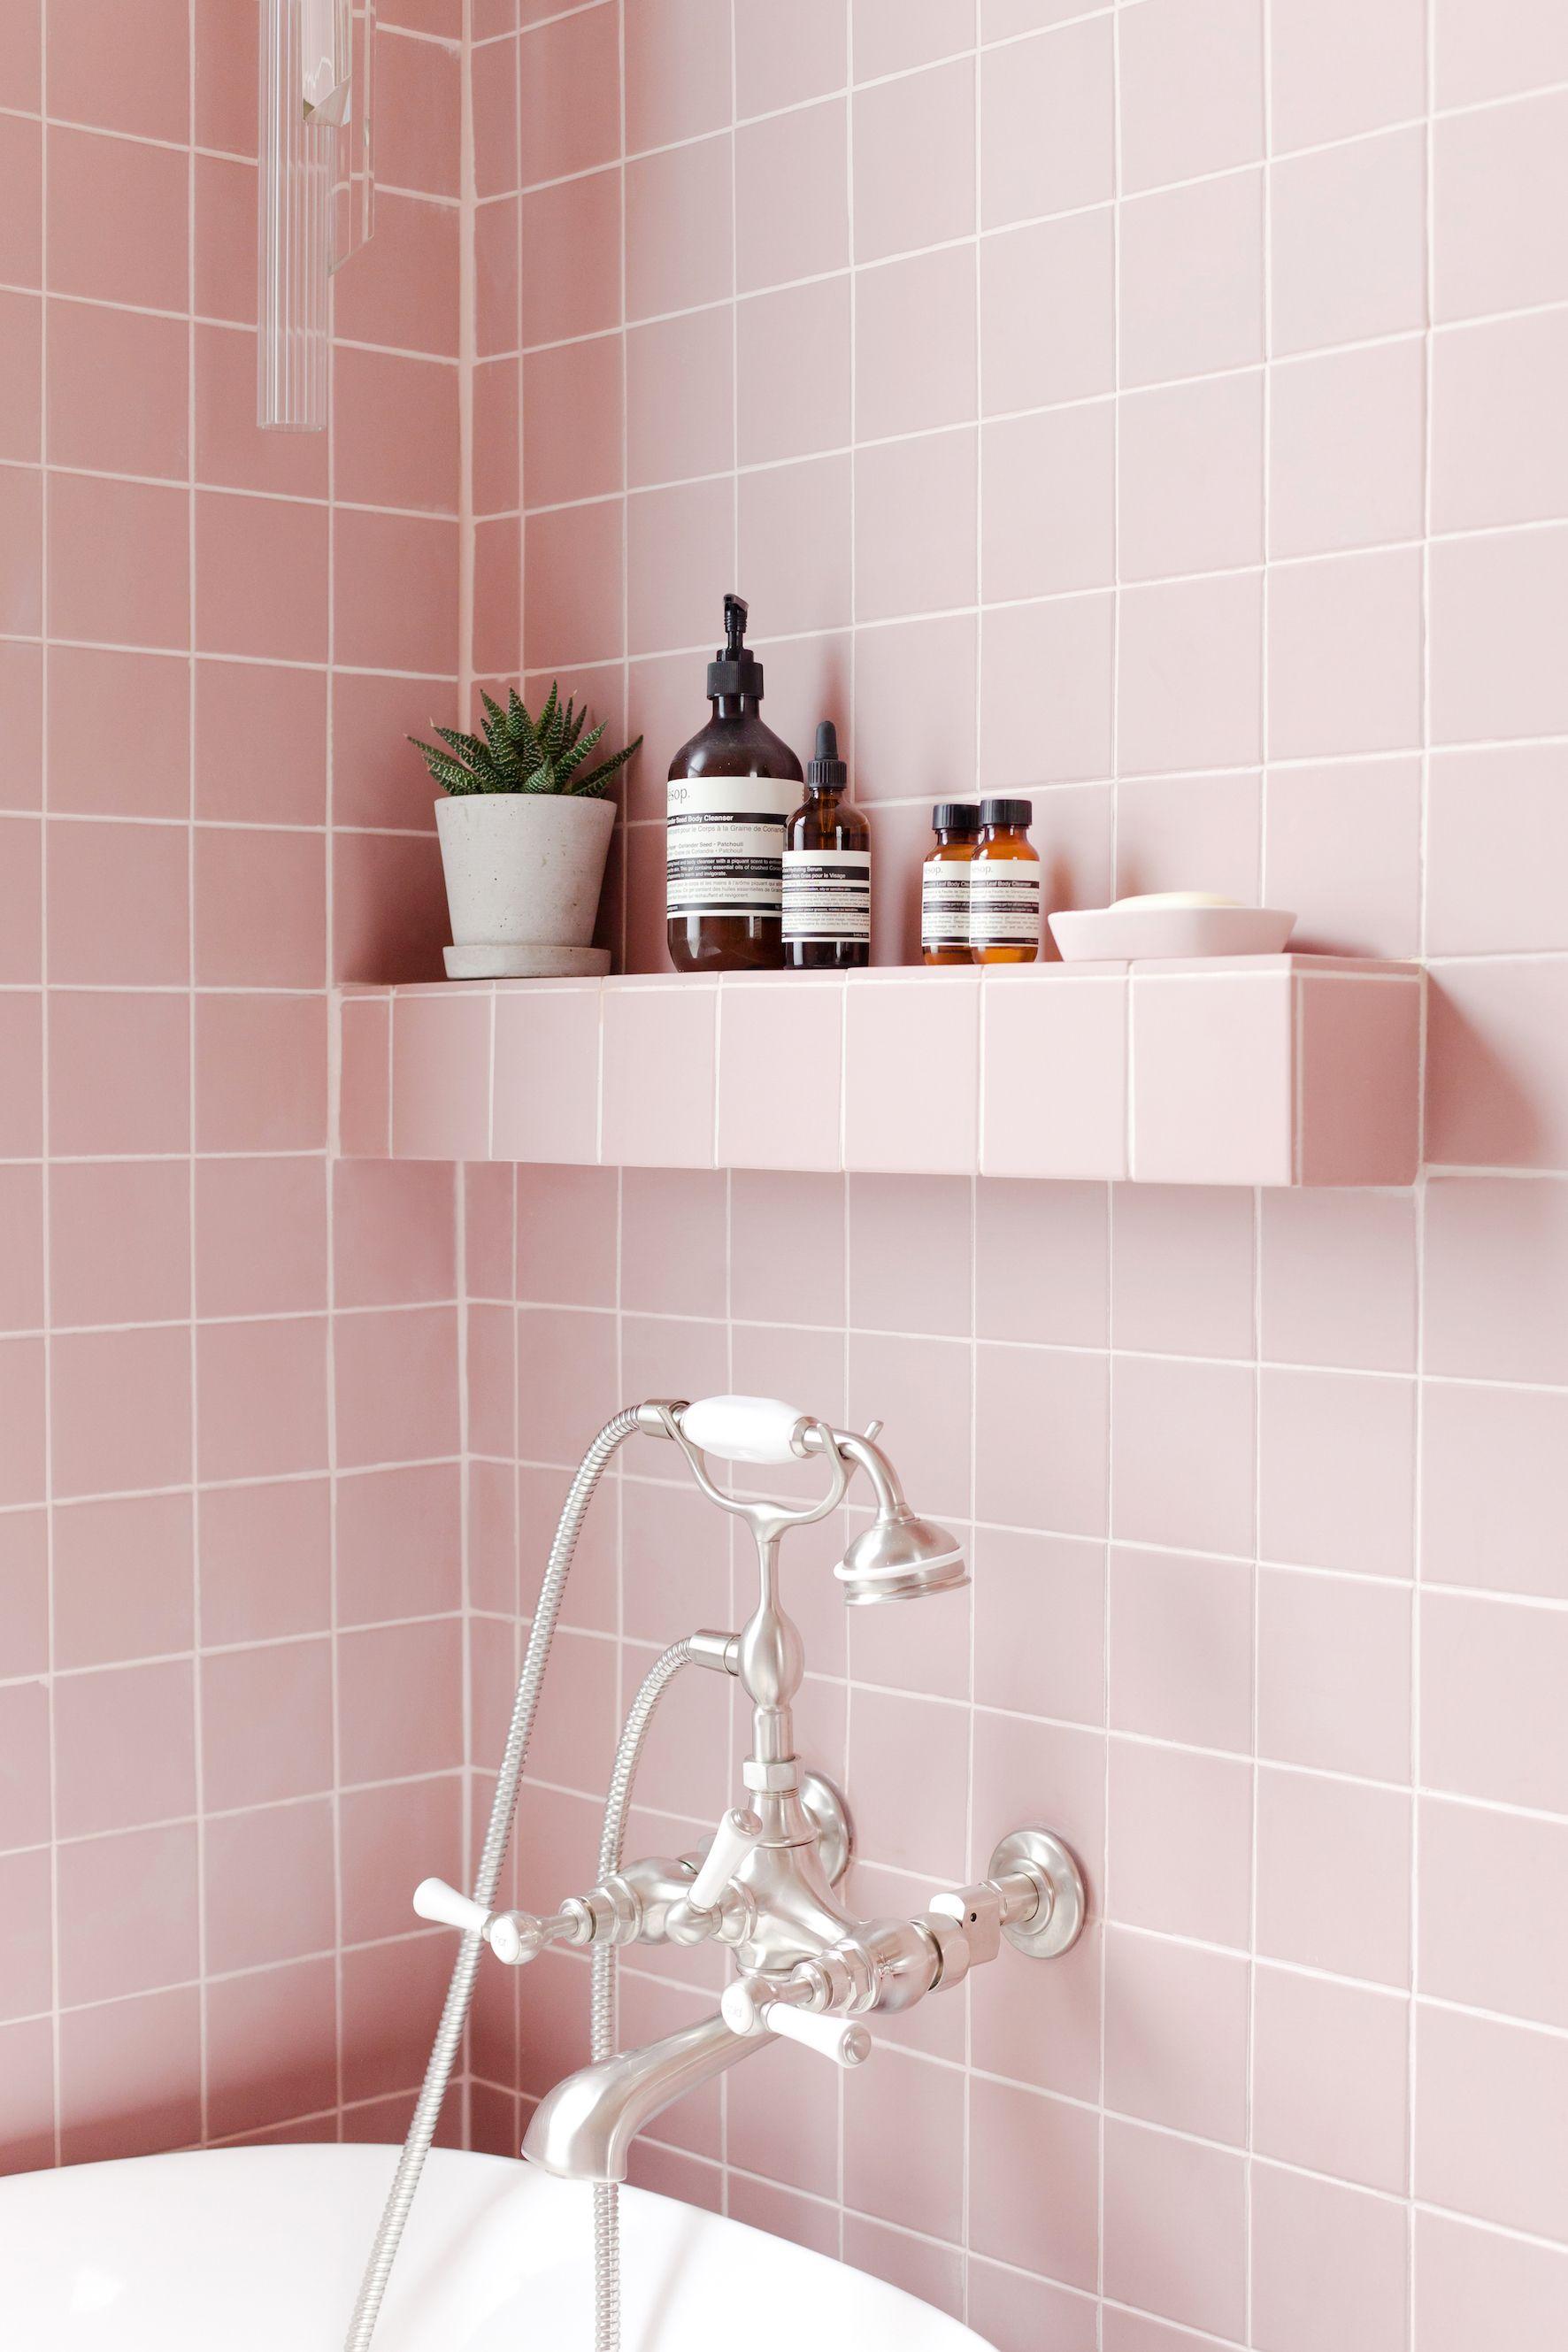 Merveilleux 2LG Studio   Pink Bathroom Look: Tile Giant Victorian Pink ...